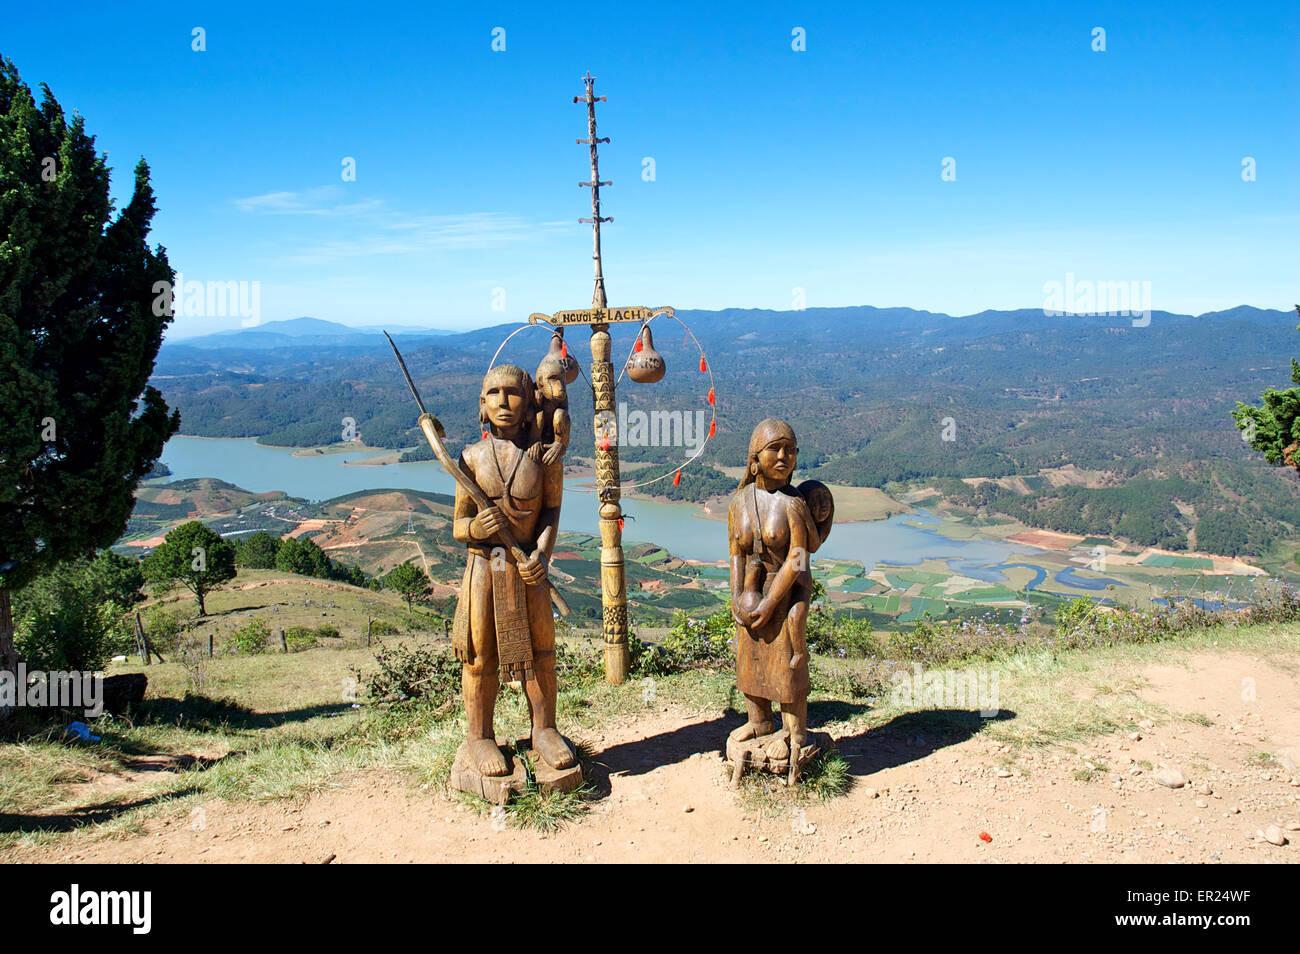 Statues of Lang and Biang, Langbiang mountains, near Da Lat, Vietnam Stock Photo